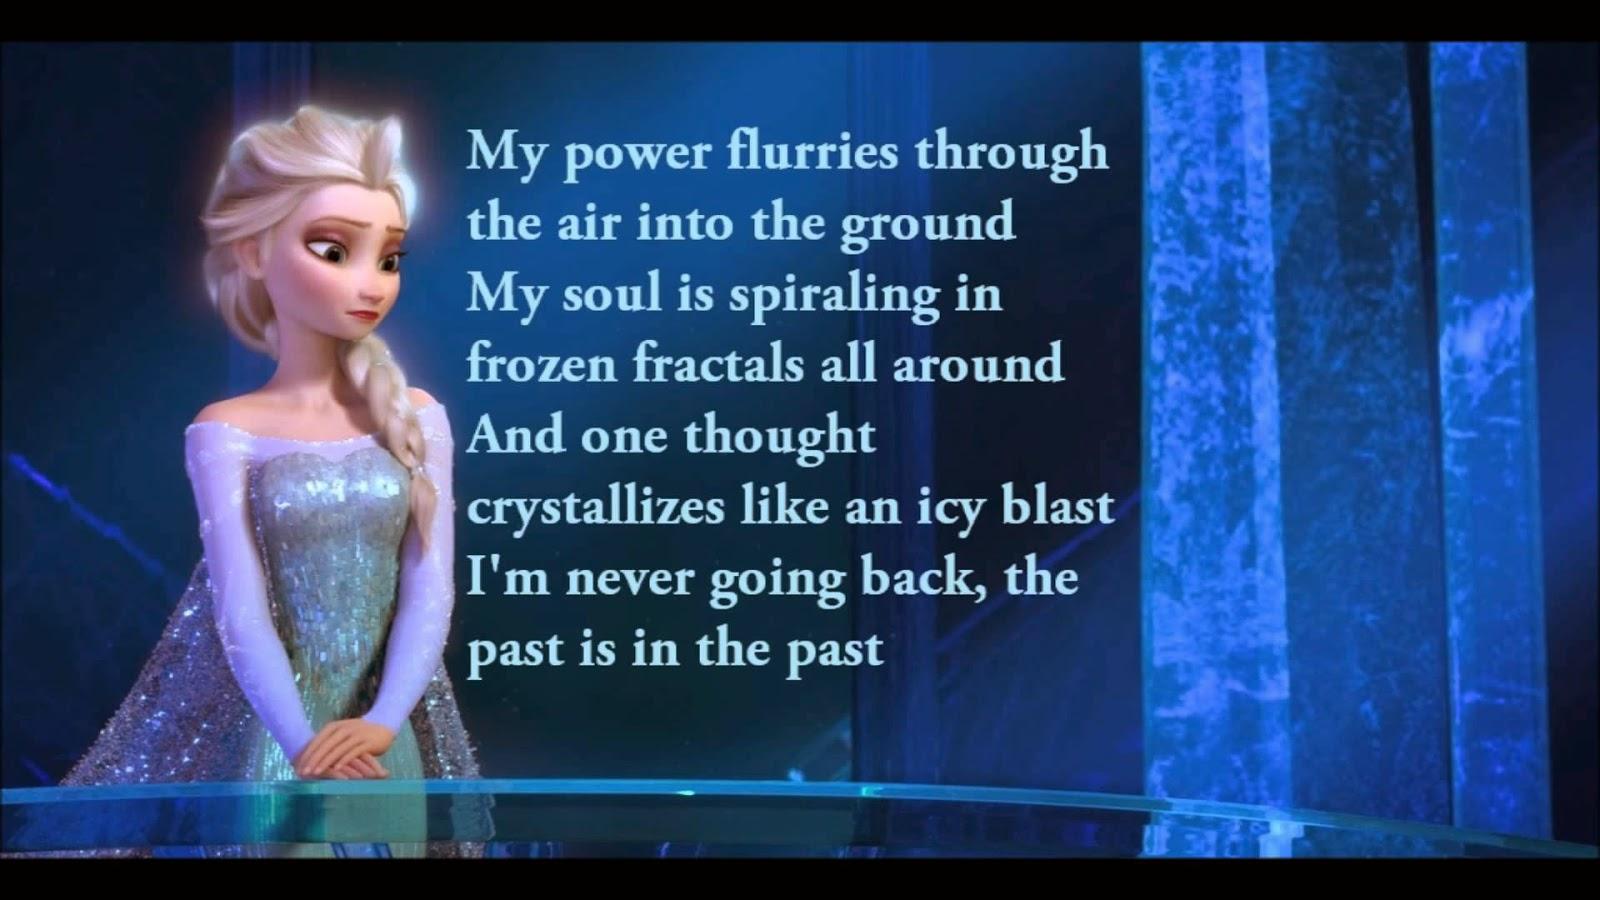 Kata Kata Cinta Mutiara Lirik Lagu Let It Go Demi Lovato